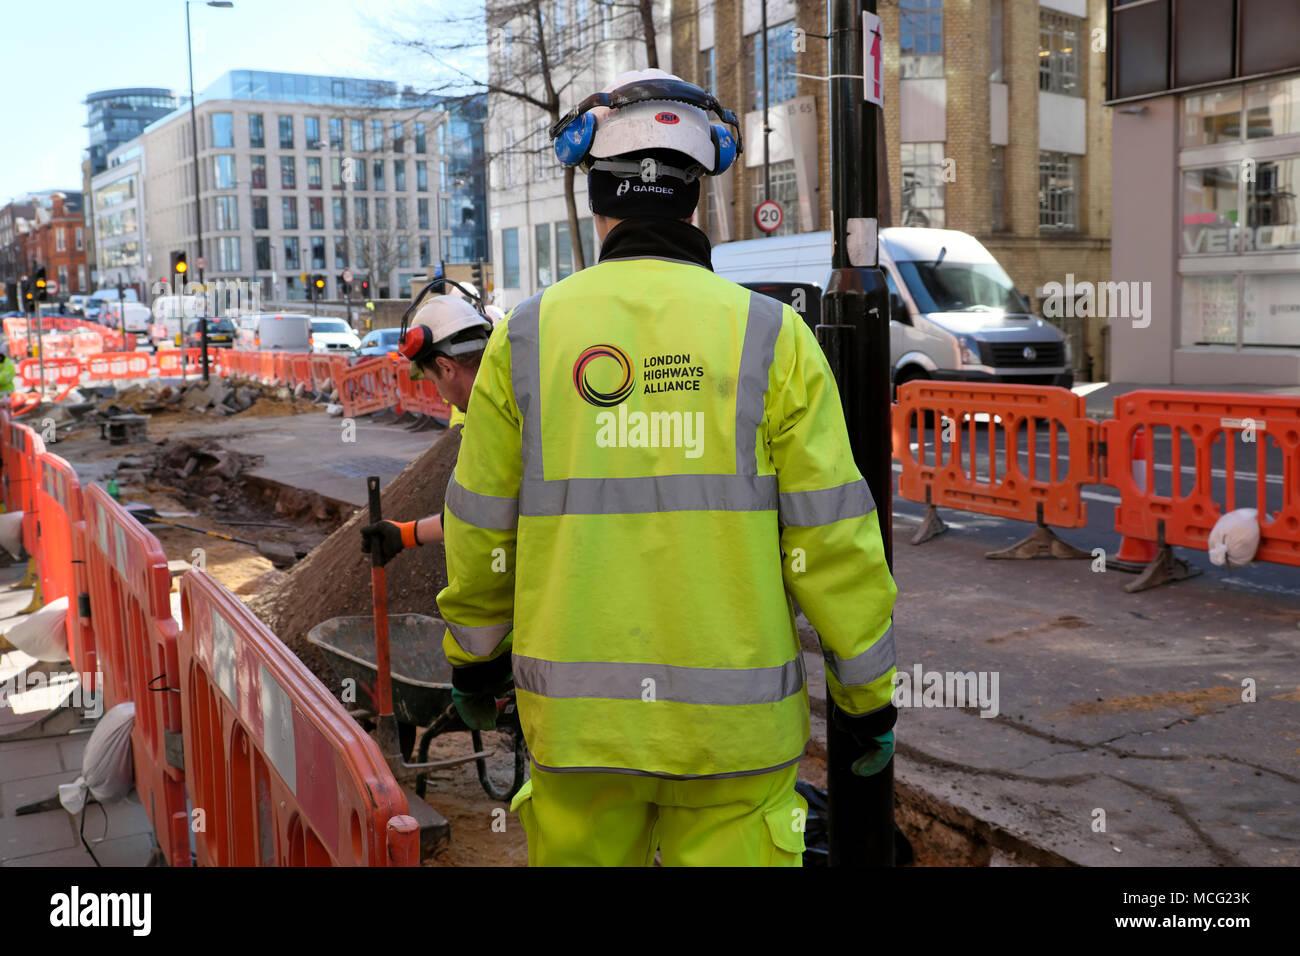 Worker wearing London Highways Alliance logo on back of jacket working on Cycle Superhighway cycling lane on Clerkenwell Road London UK  KATHY DEWITT - Stock Image